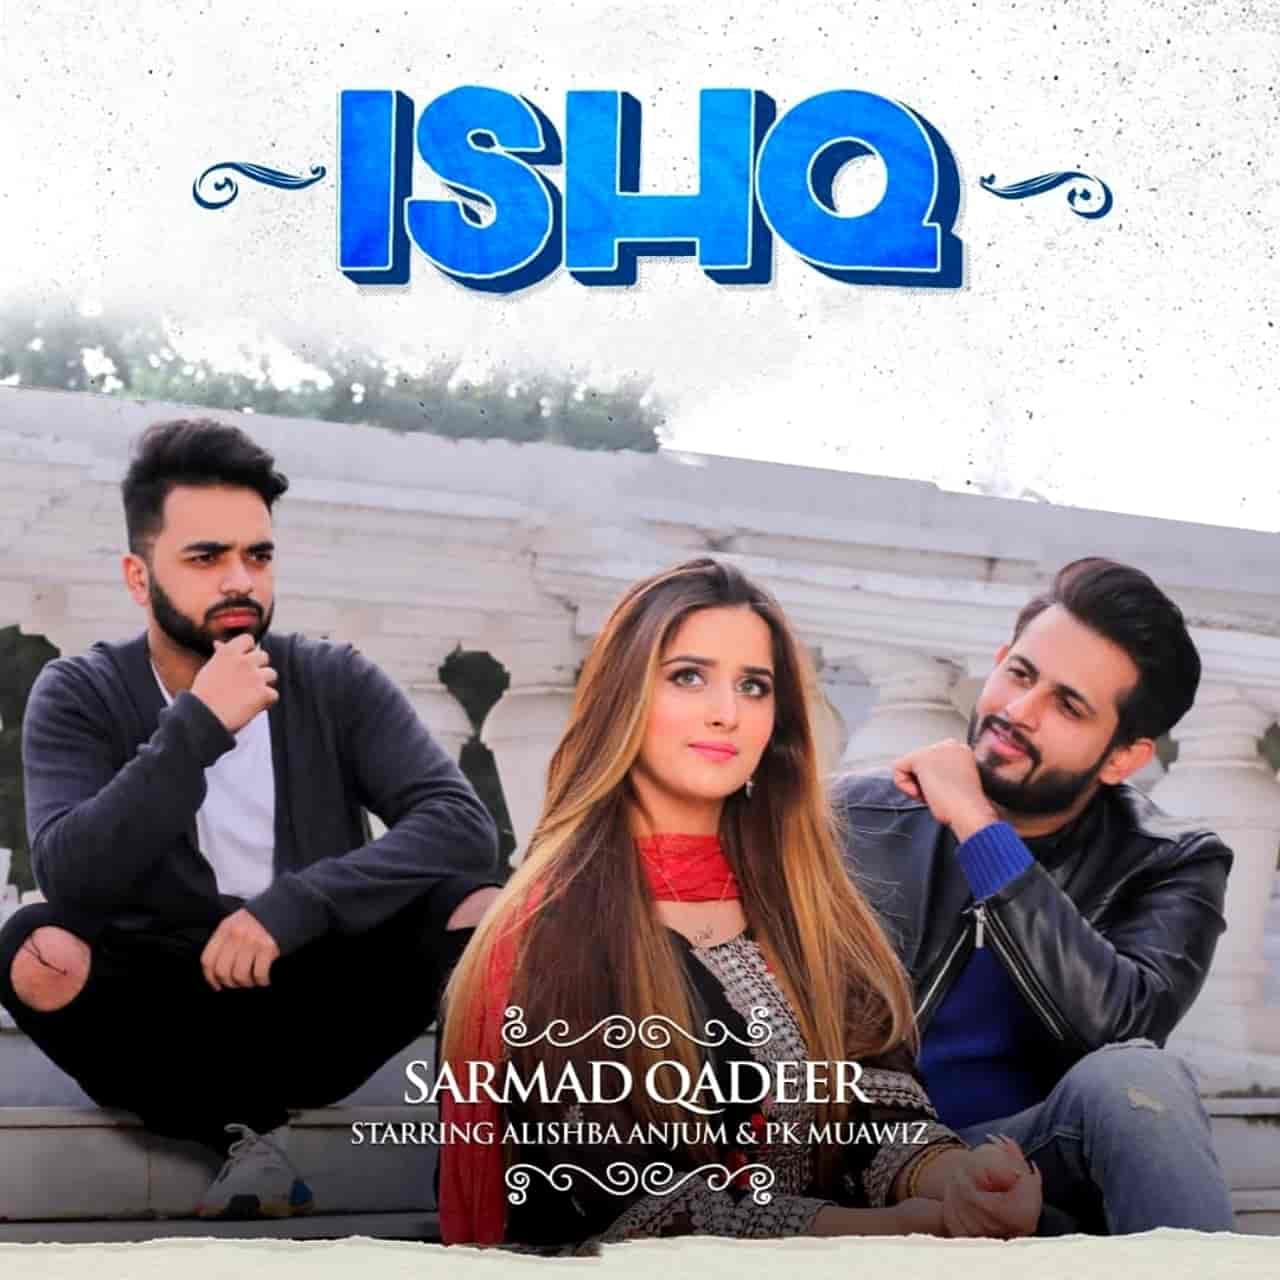 Ishq Song Image Features Alishba Anjum And Pk Muawiz